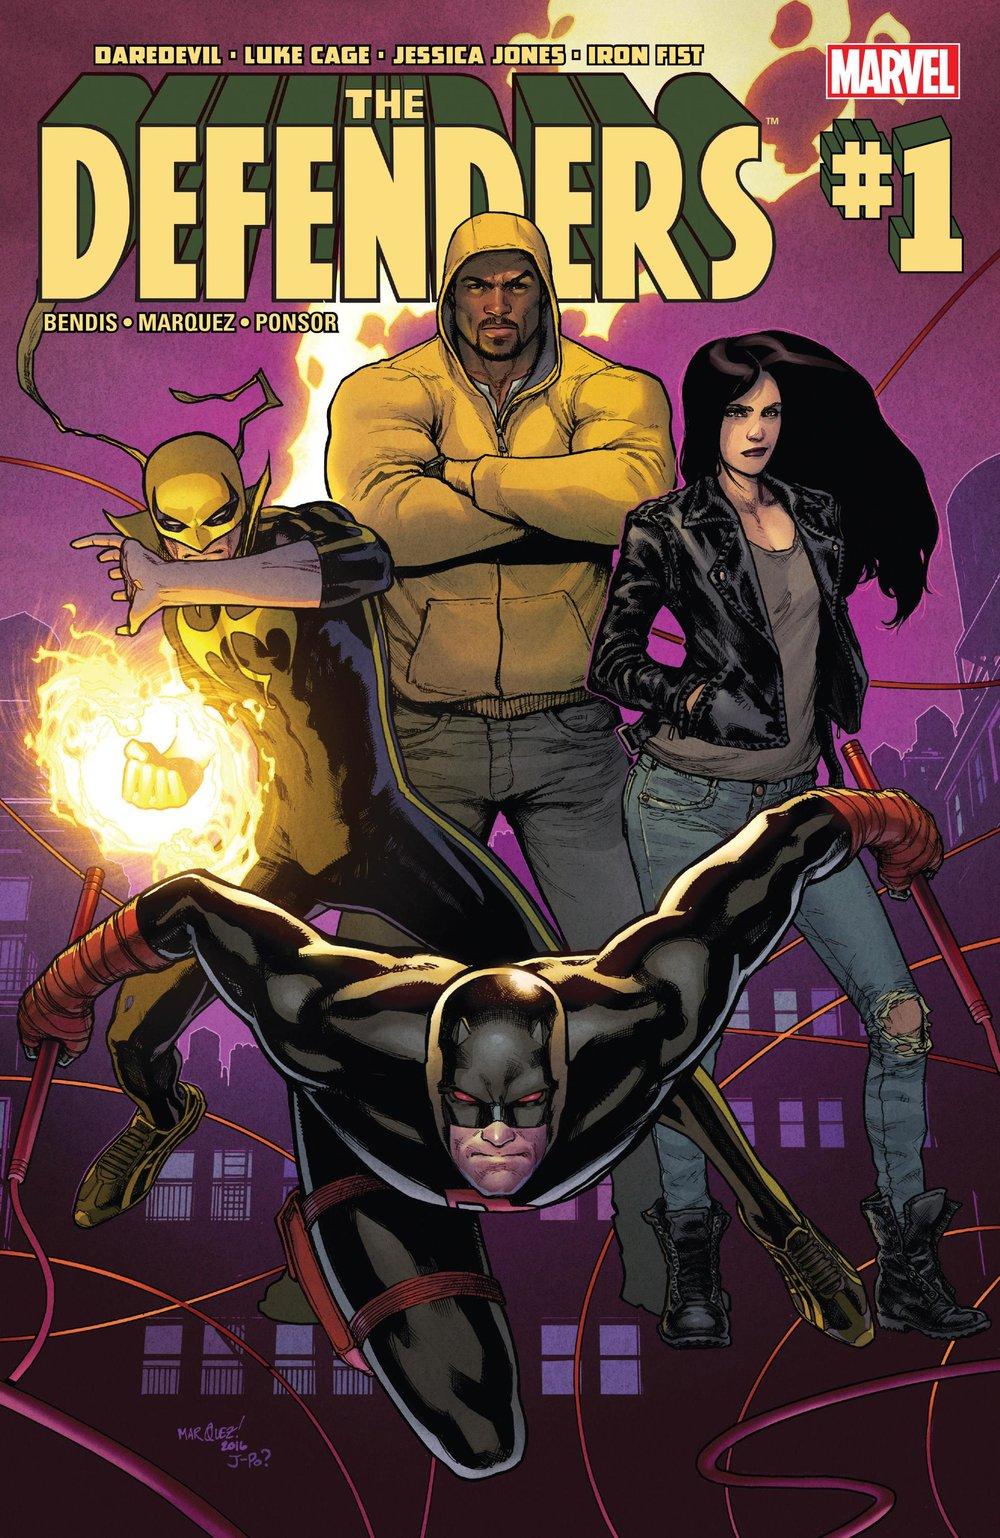 Defenders #1 (Marvel) - By Brian Michael Bendis / Artist: David Marquez